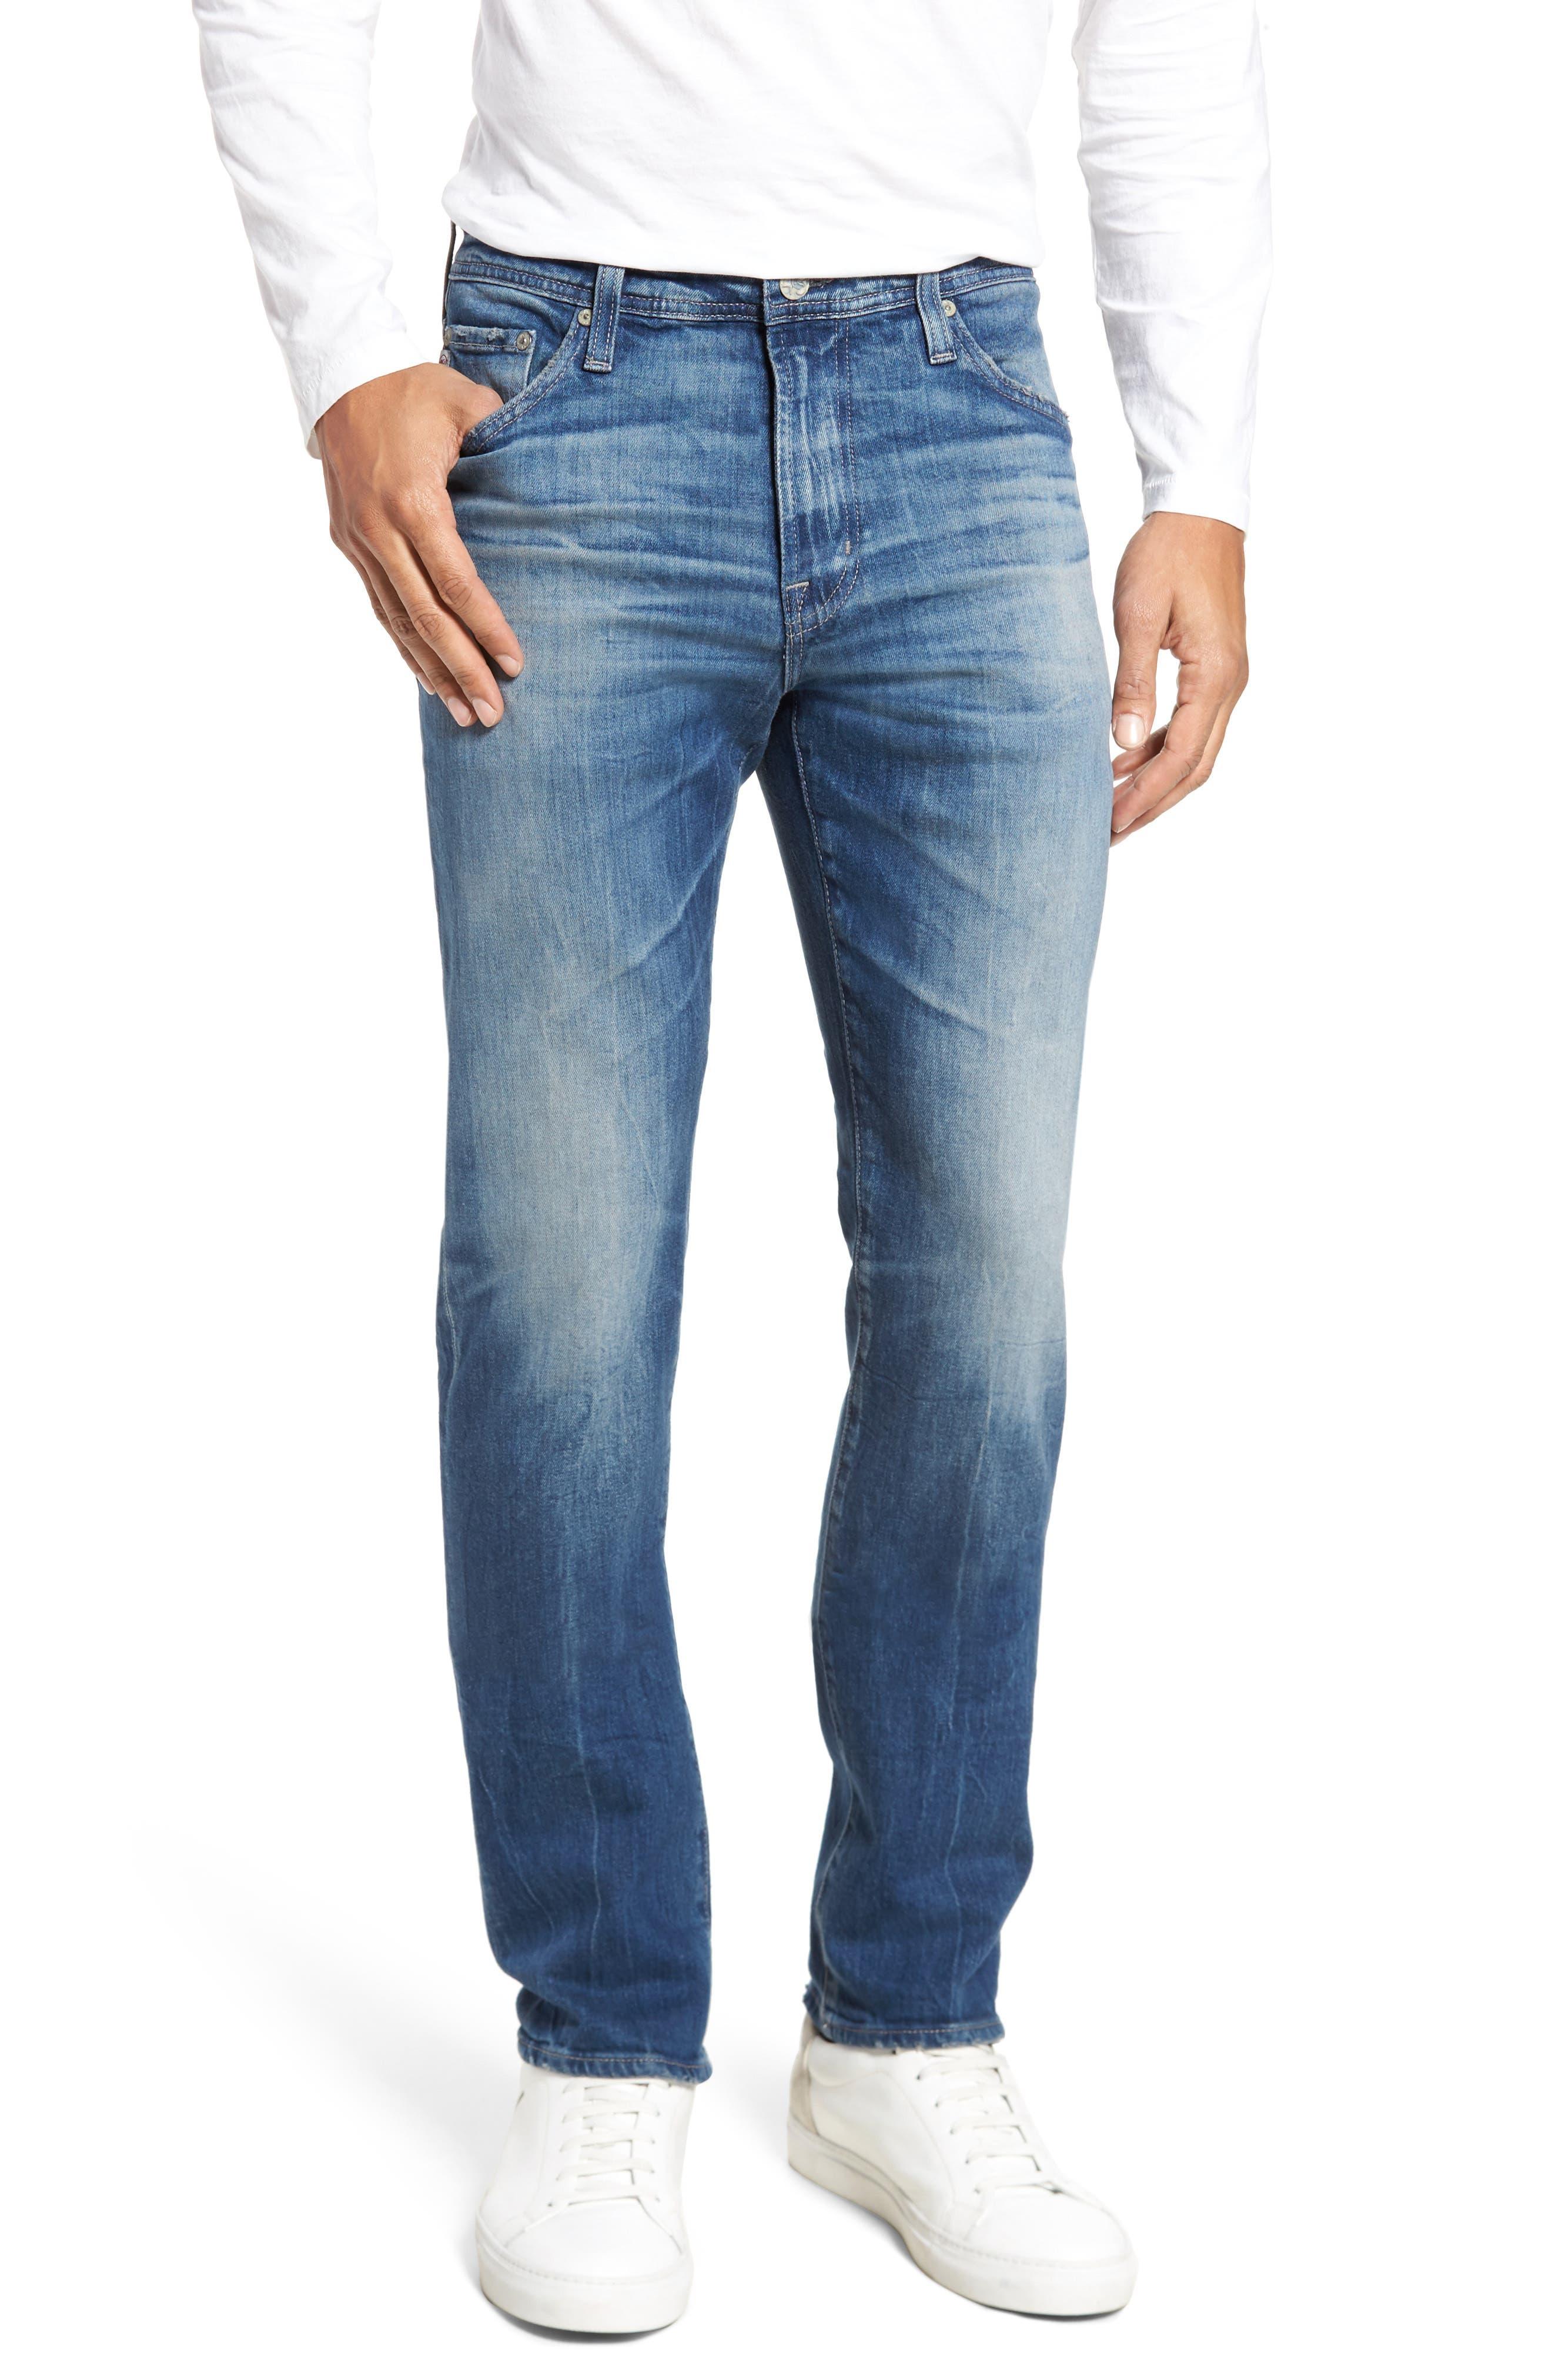 Everett Slim Straight Leg Jeans,                             Main thumbnail 1, color,                             429